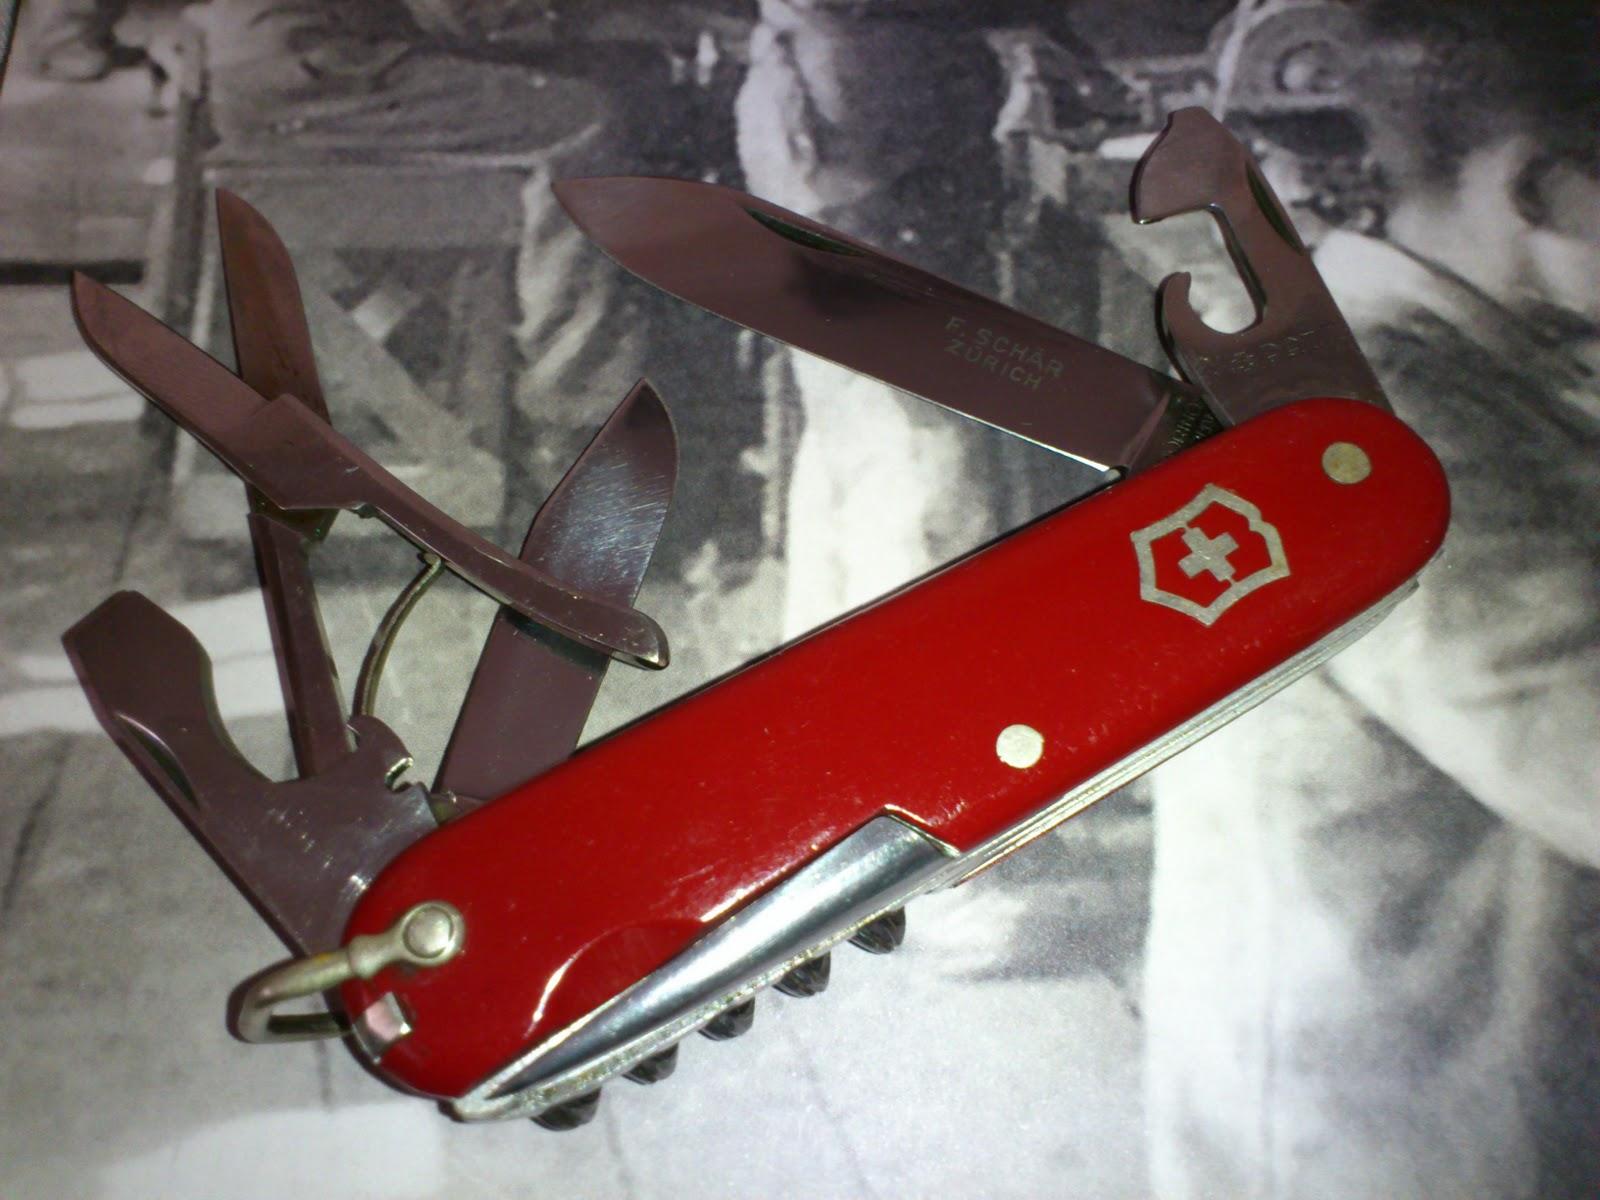 Mario S Swiss Army Knives Vintage Victorinox Climber